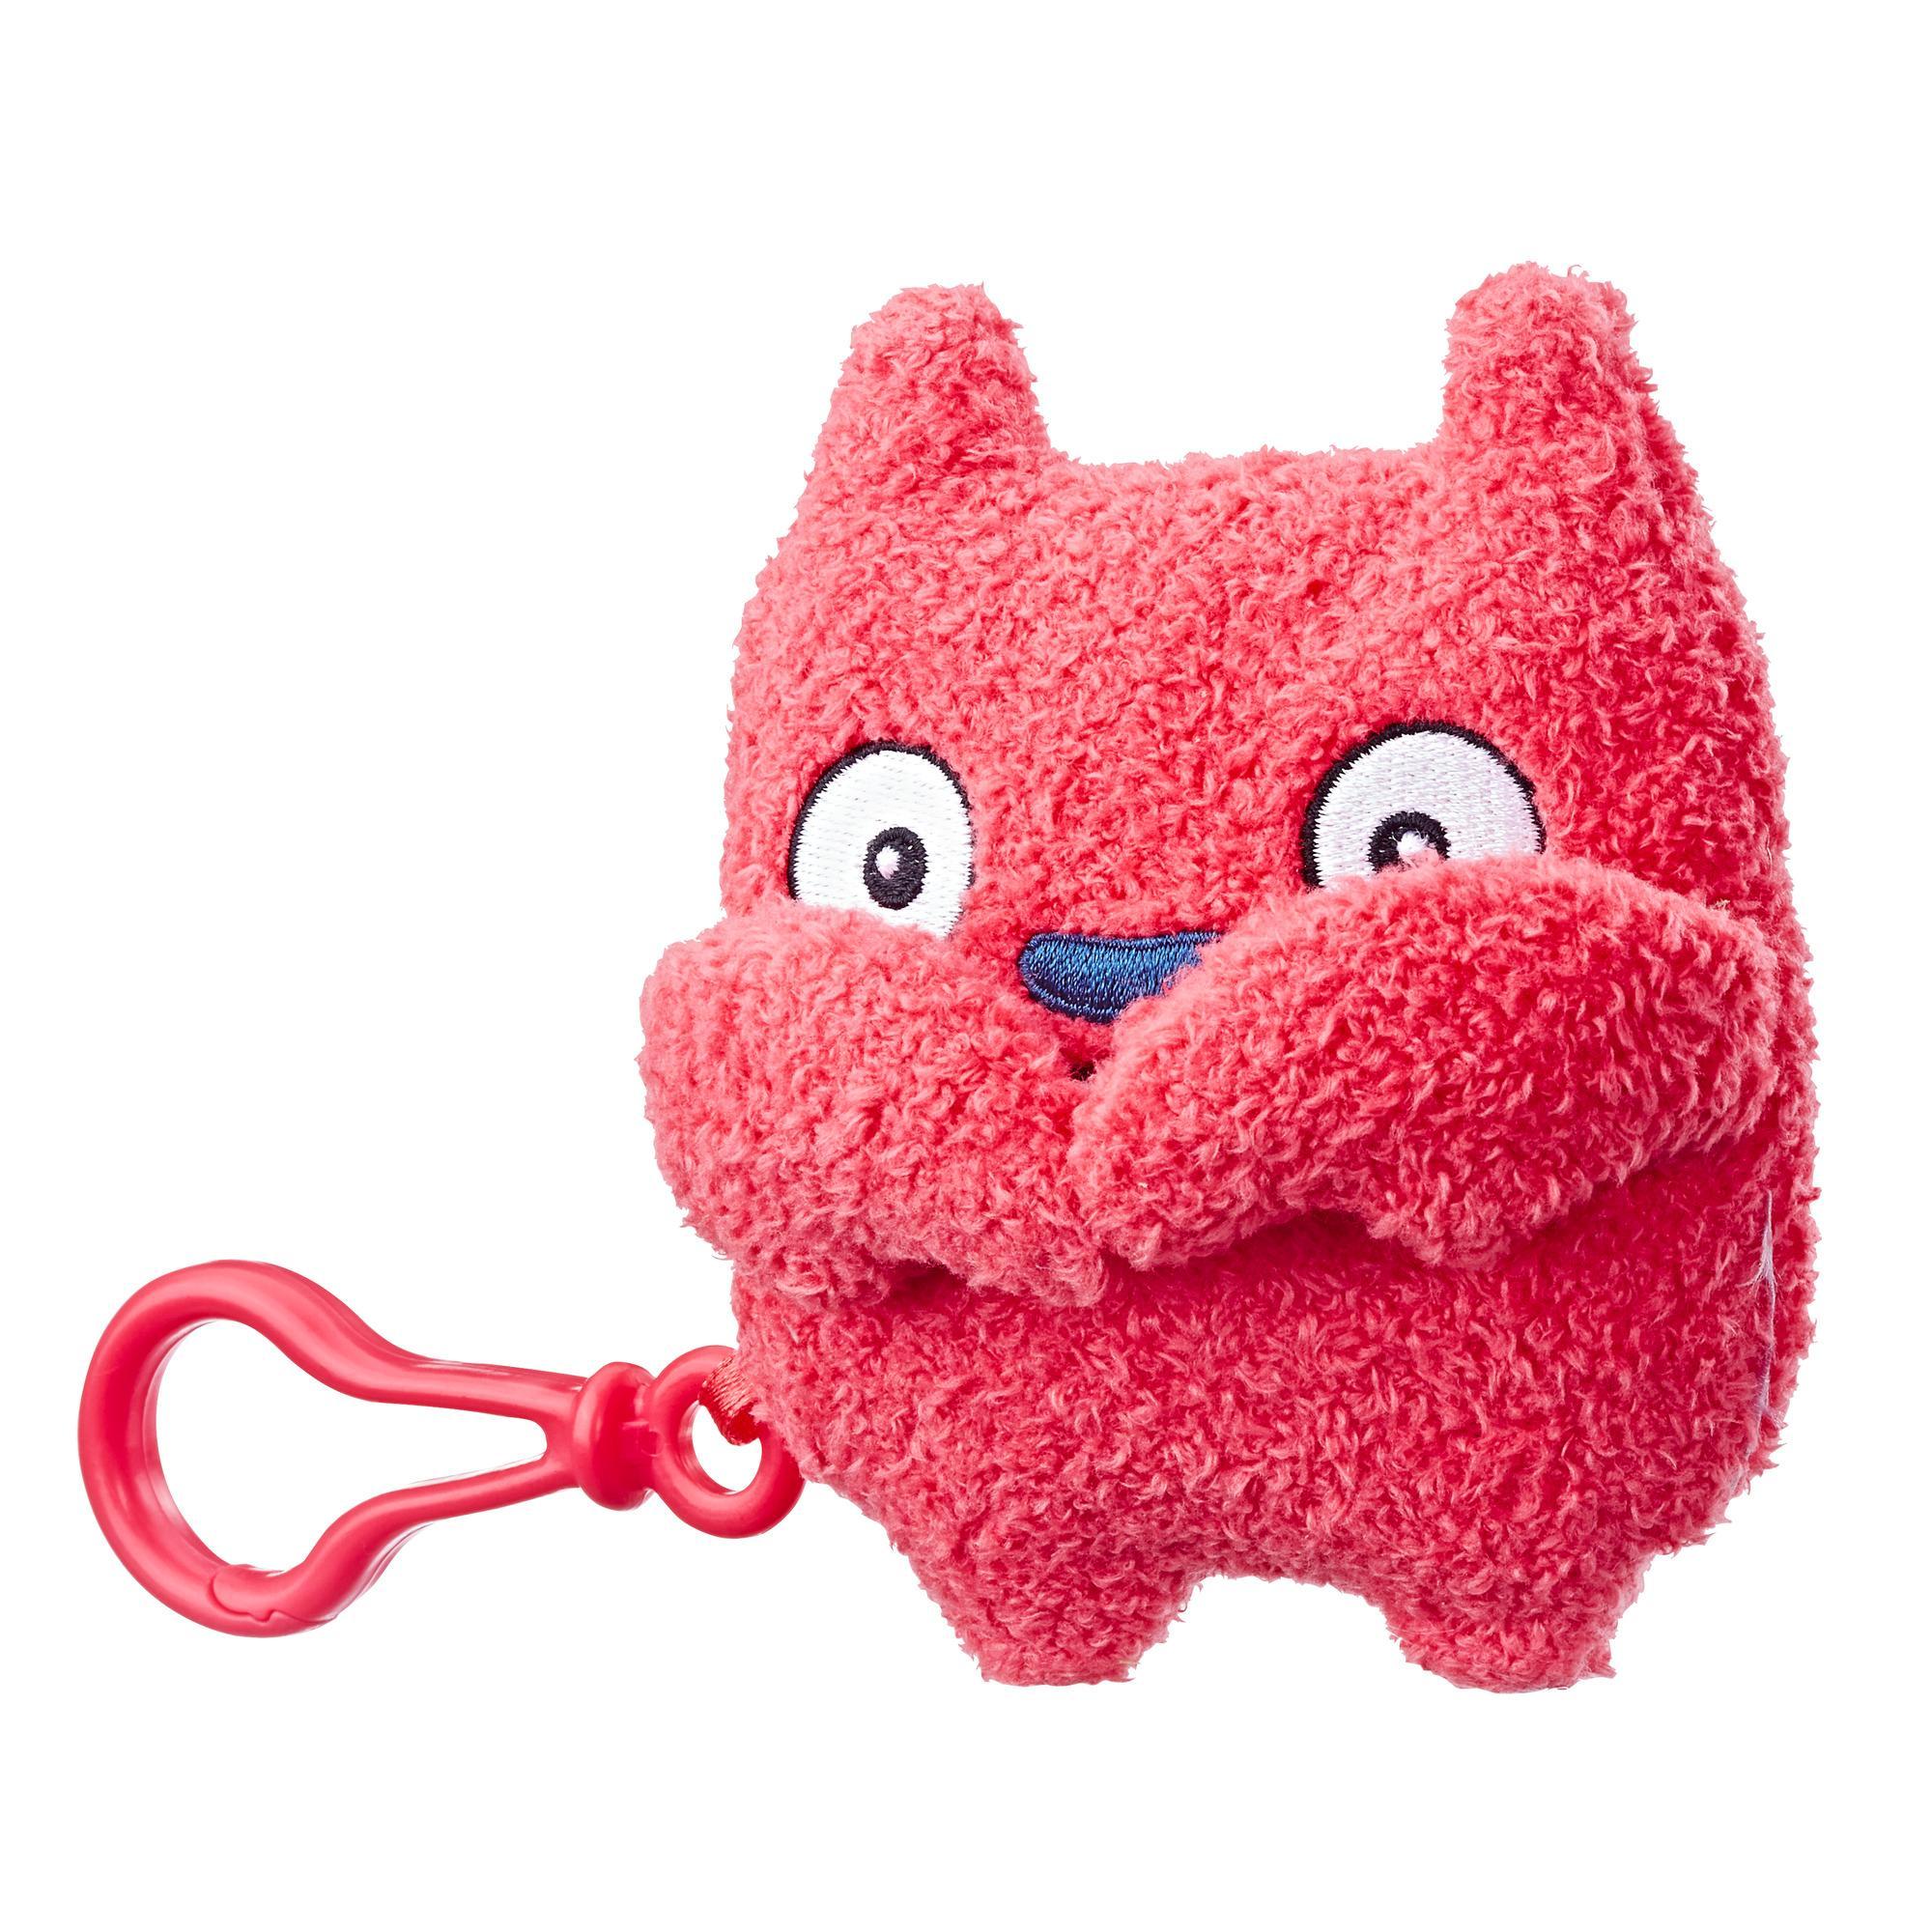 UglyDolls Lucky Bat Para Levar - Brinquedo de Pelúcia de 13 cm